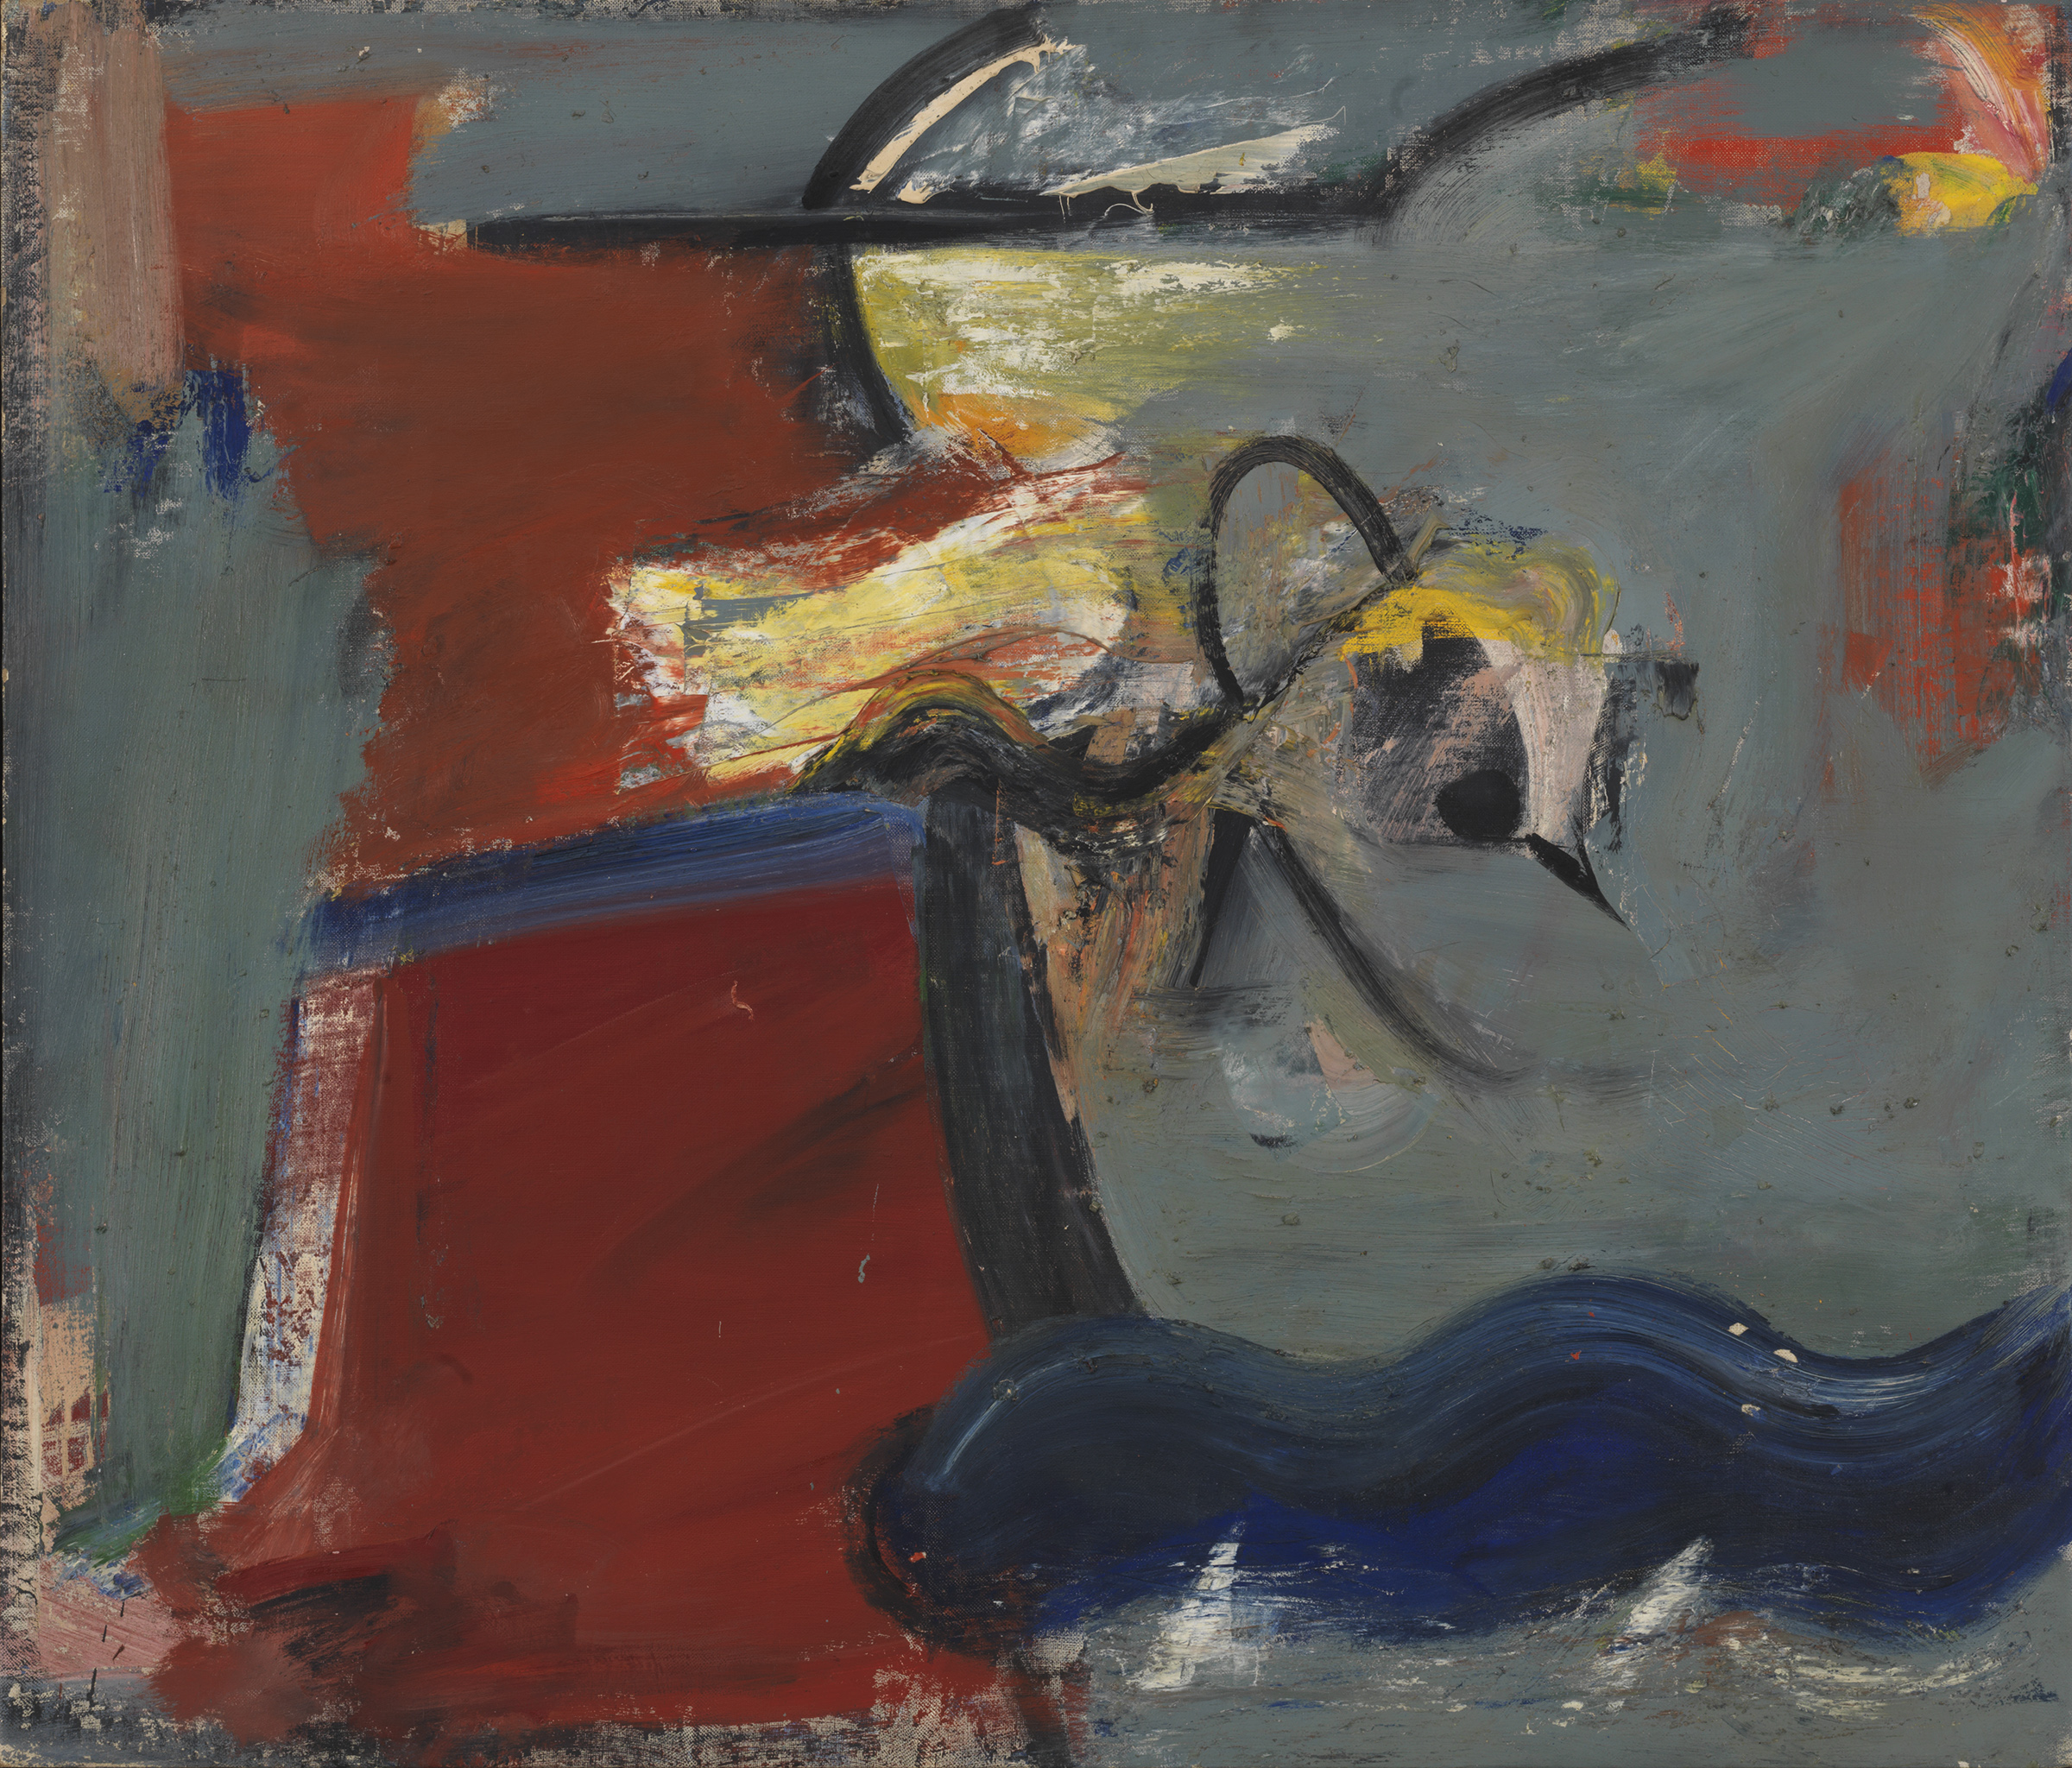 Pat Passlof  March Bird , 1956 Oil on linen 37 x 44 inches